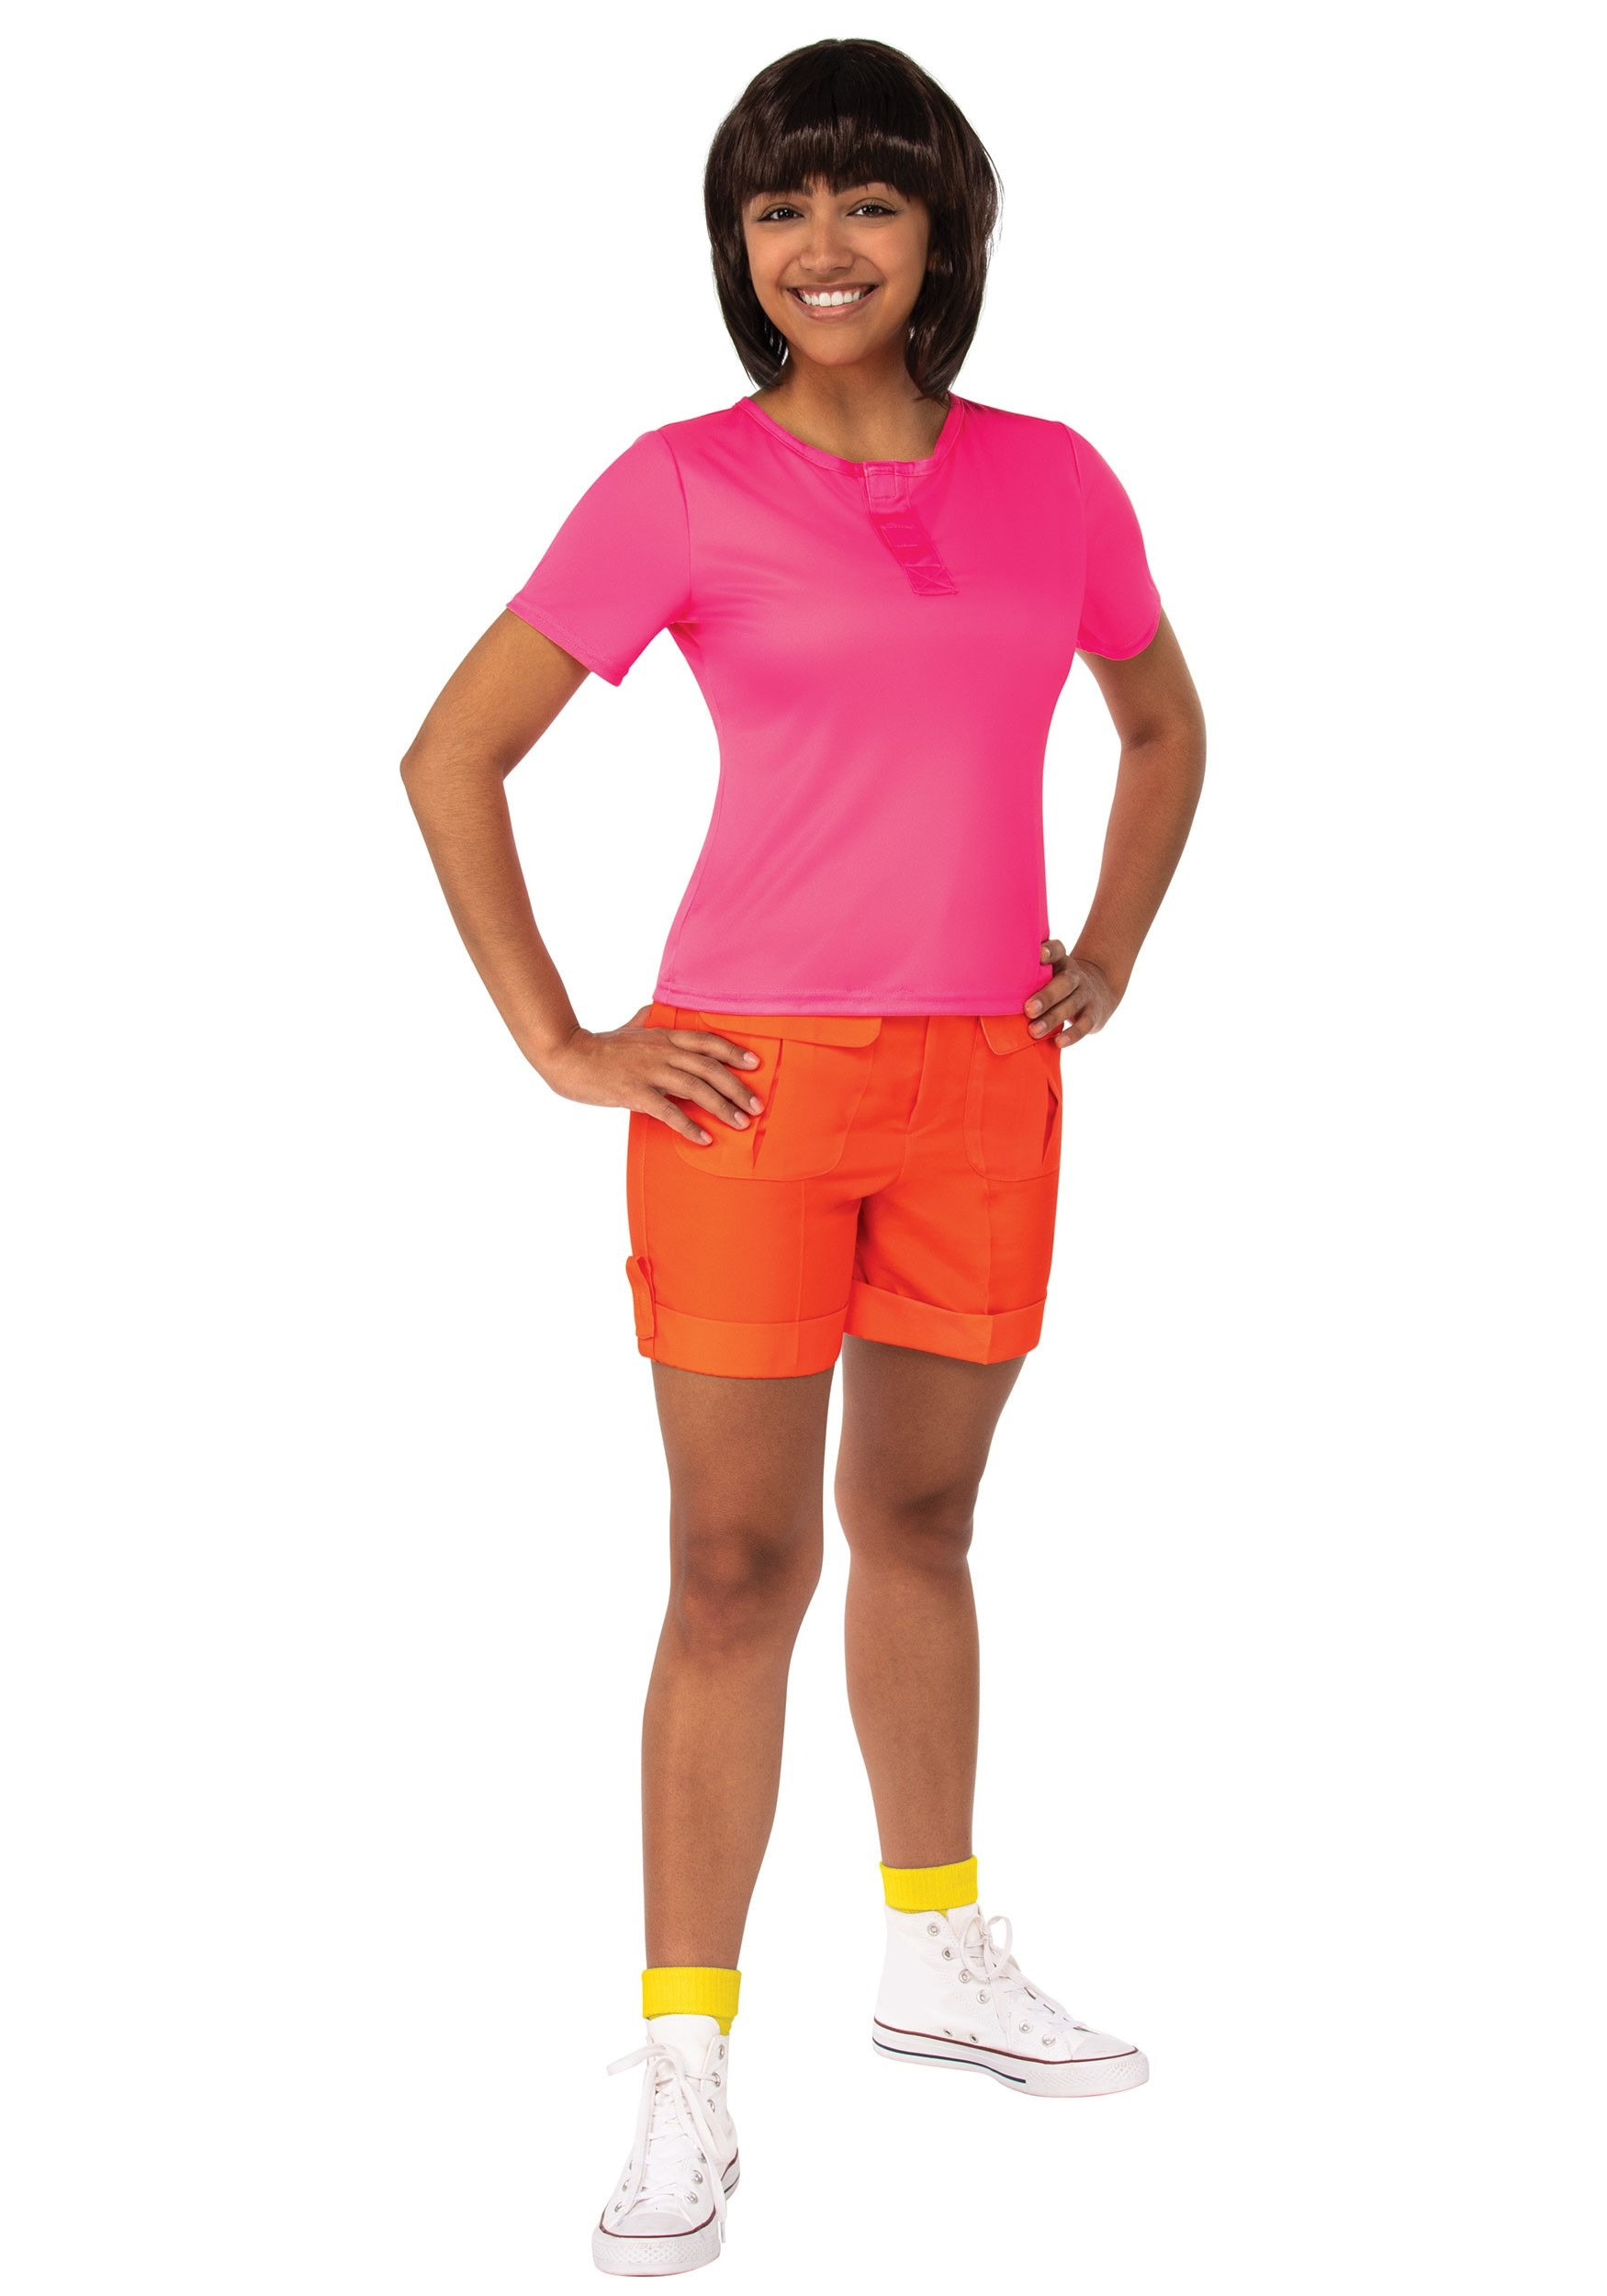 Dora the Explorer Dora Deluxe Costume for Adults